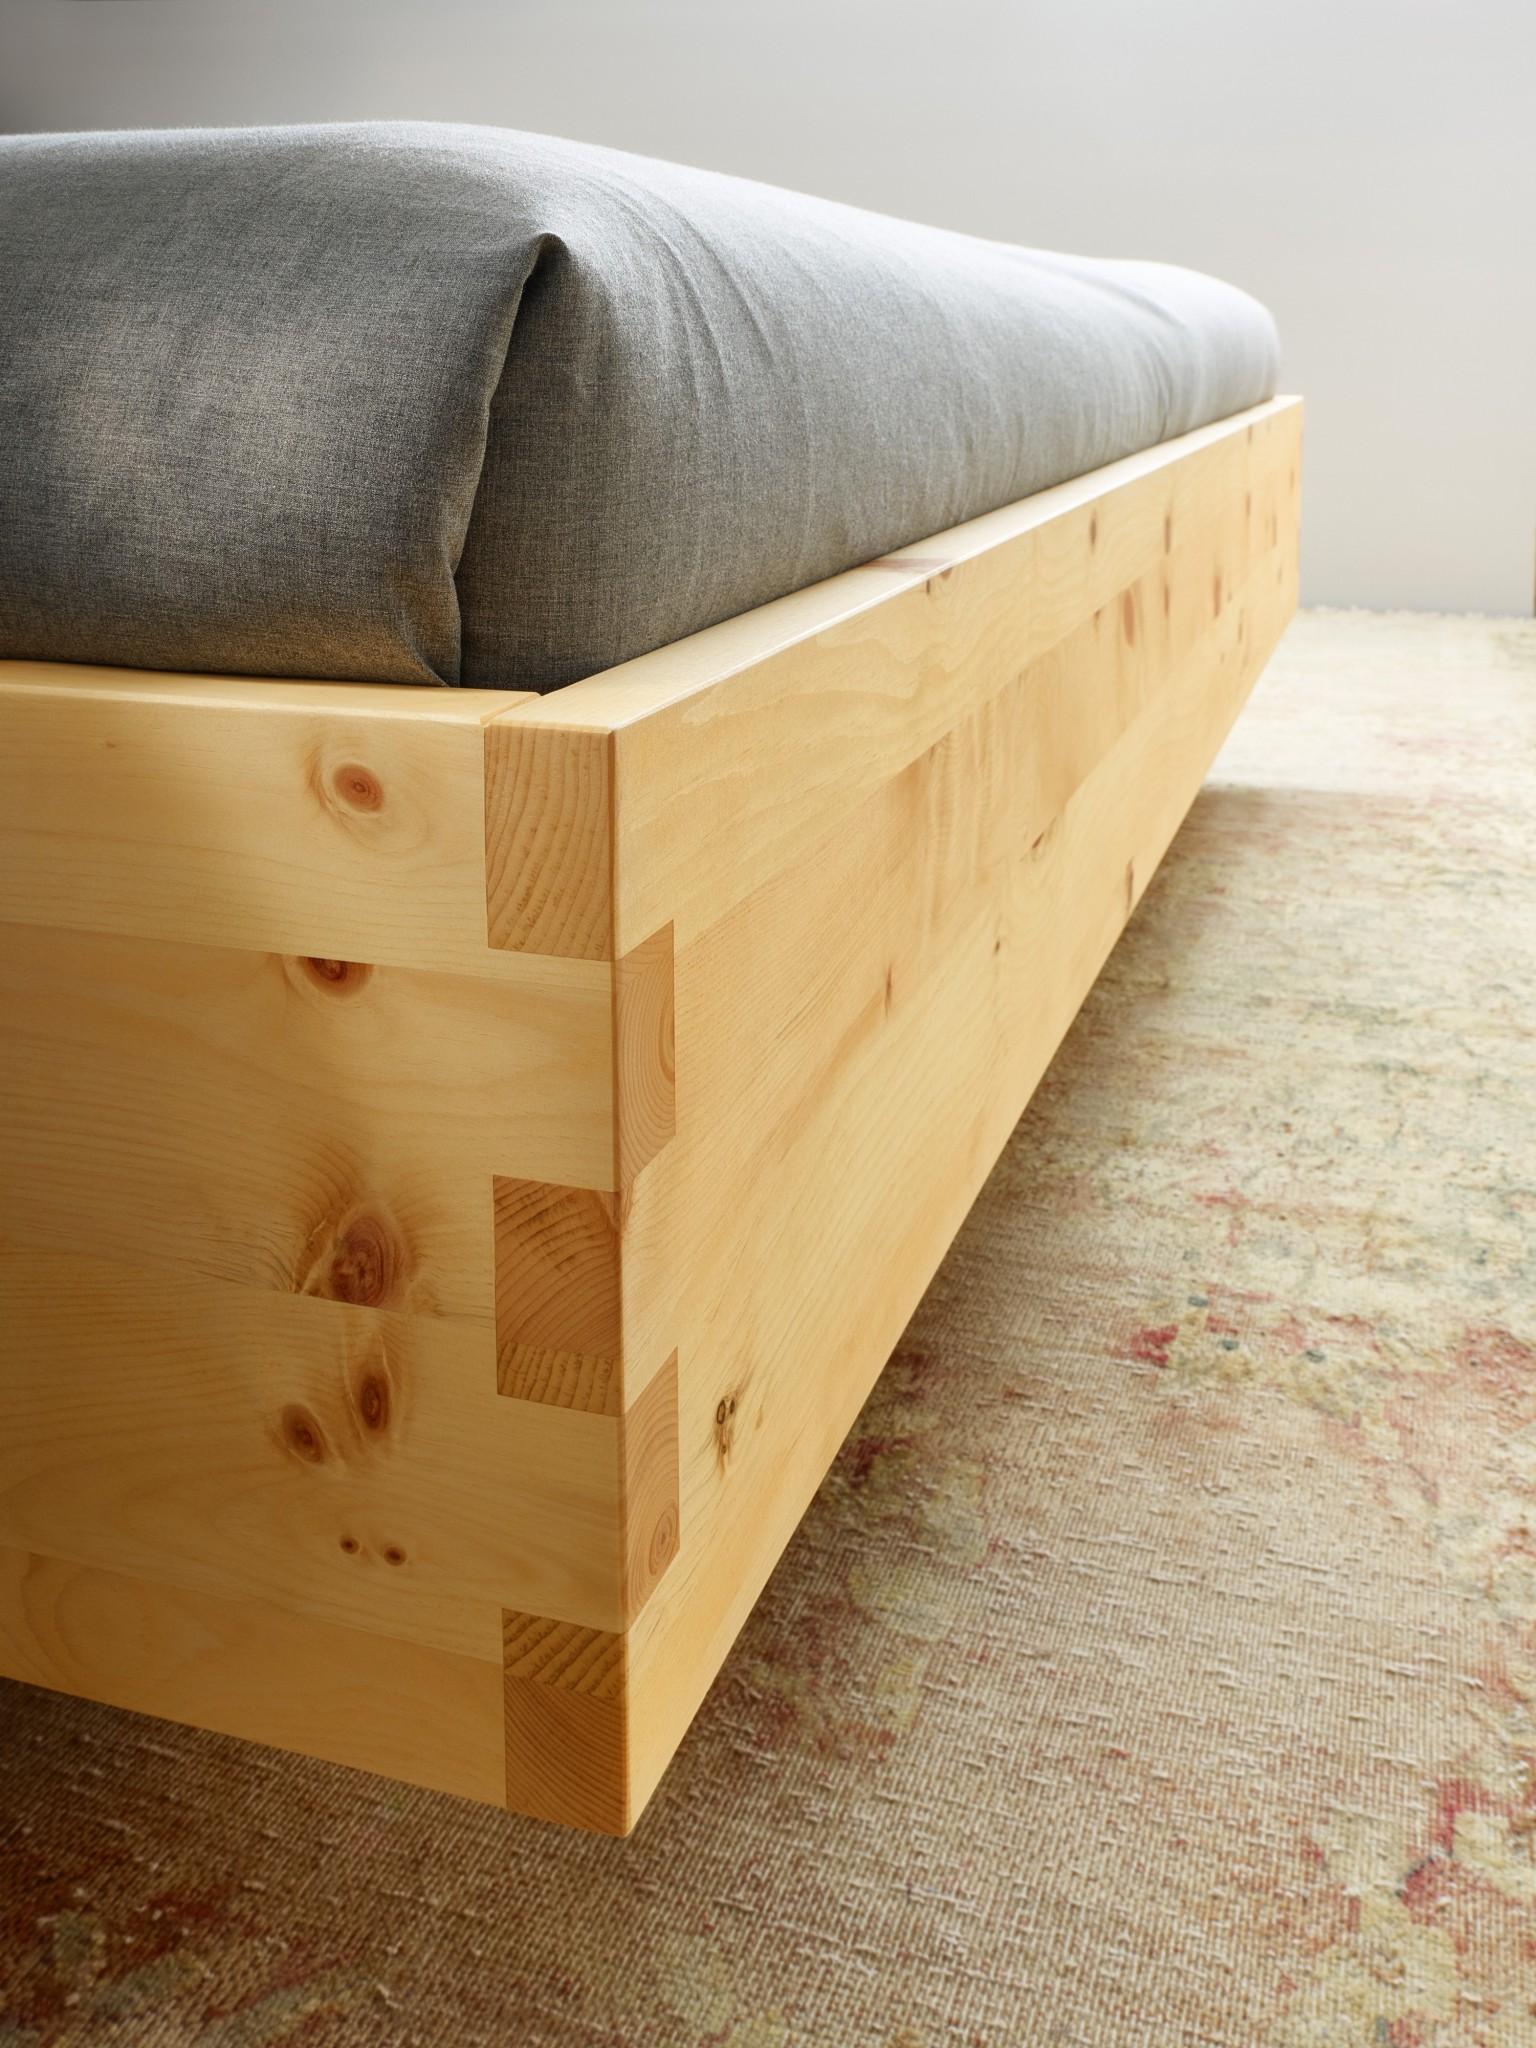 massivholzbett paso in zirbe ge lt oder naturbelassen m bel polt m belhaus. Black Bedroom Furniture Sets. Home Design Ideas